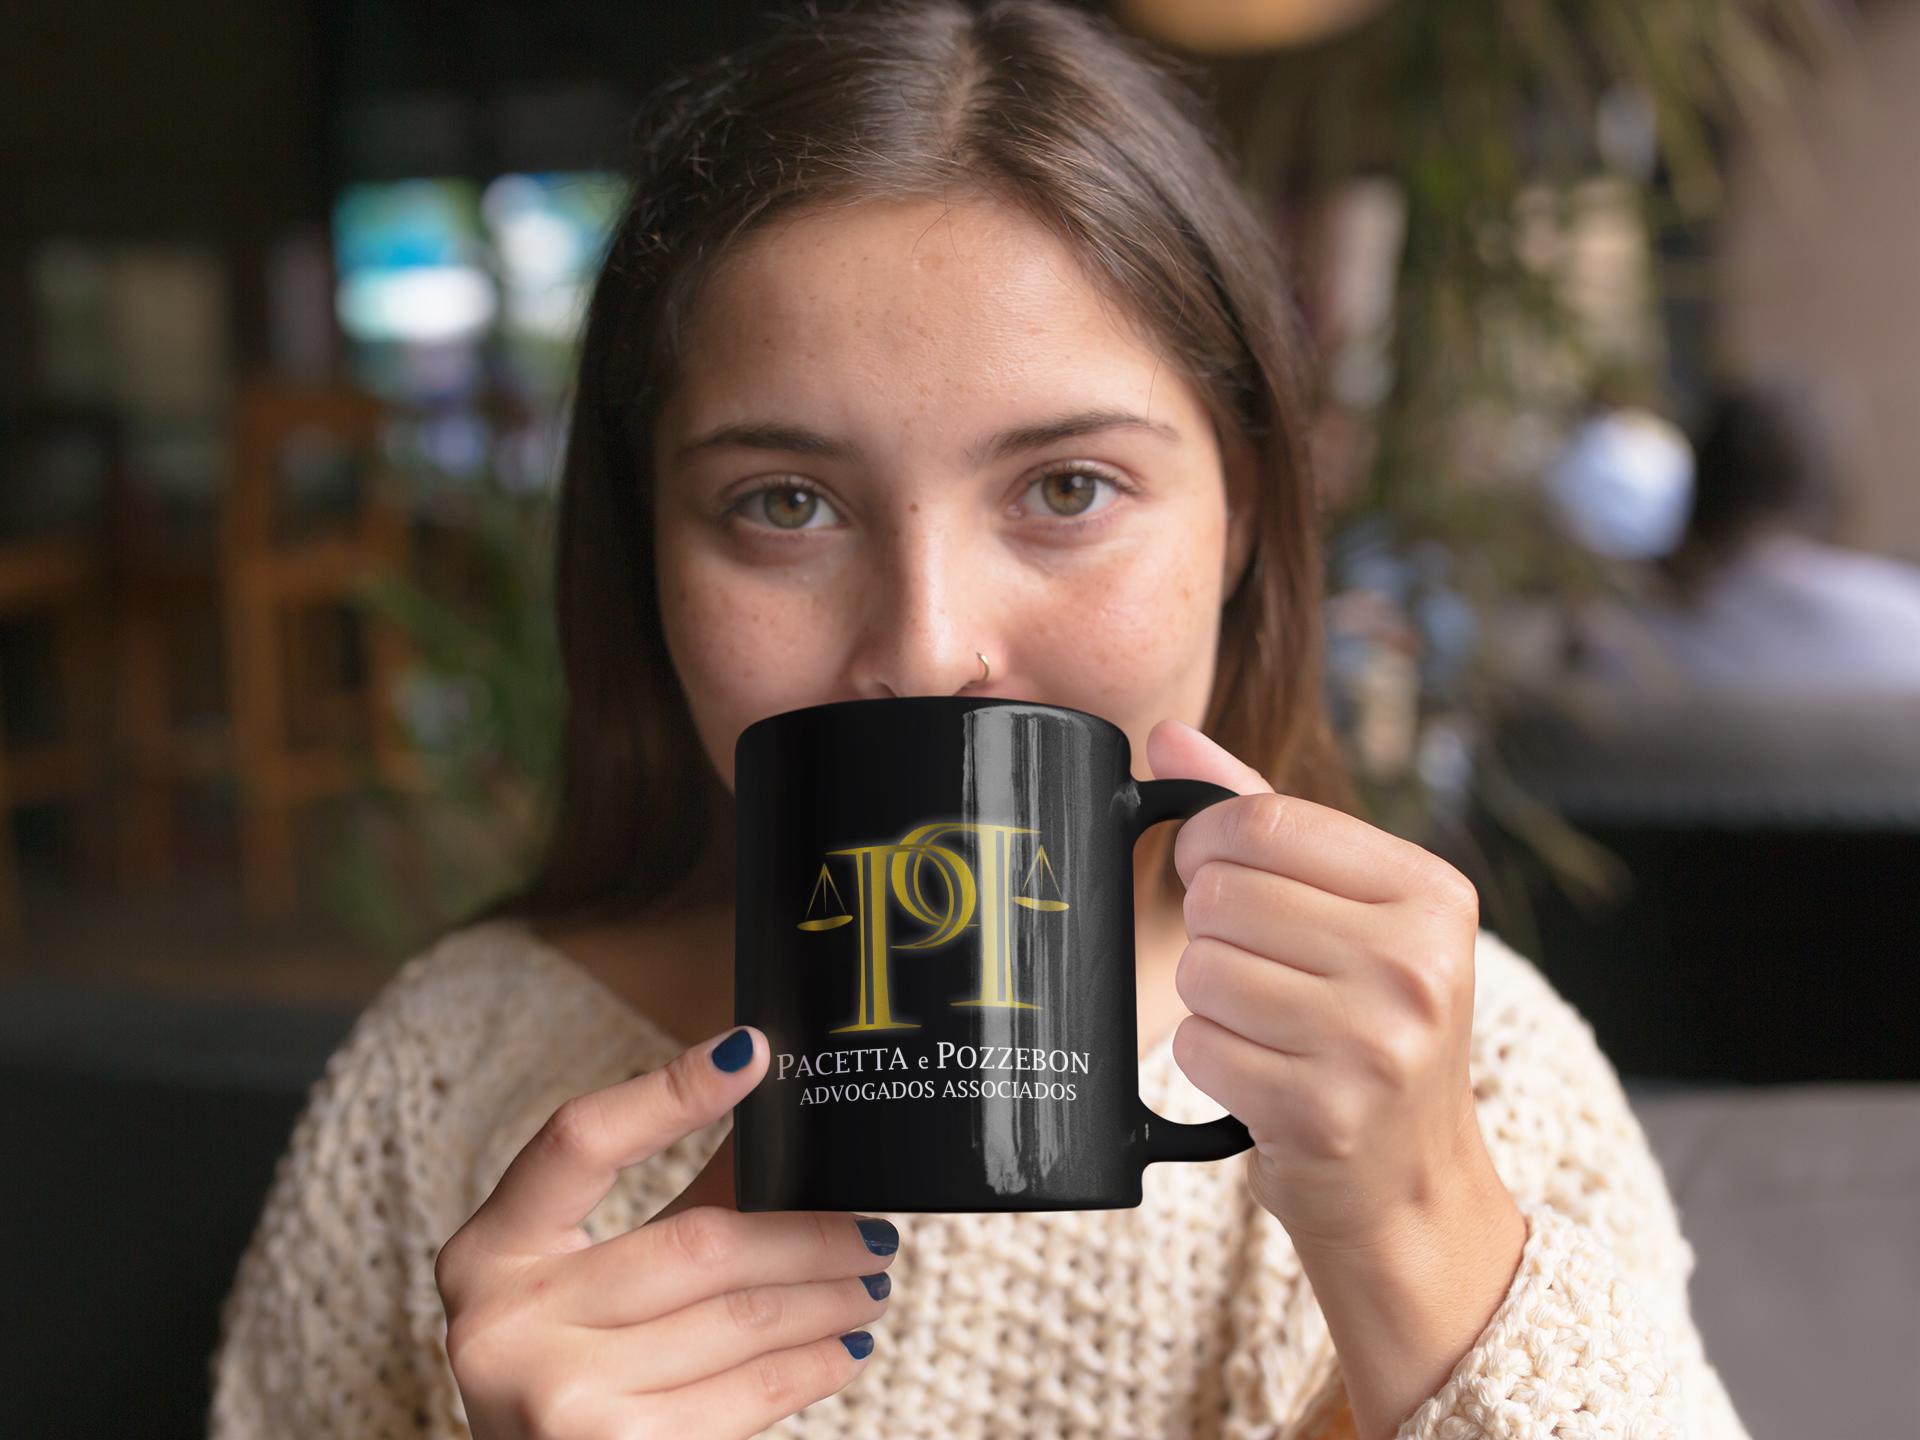 mug-mockup-of-a-beautiful-girl-drinking-a-hot-beverage-a11943 (1).png